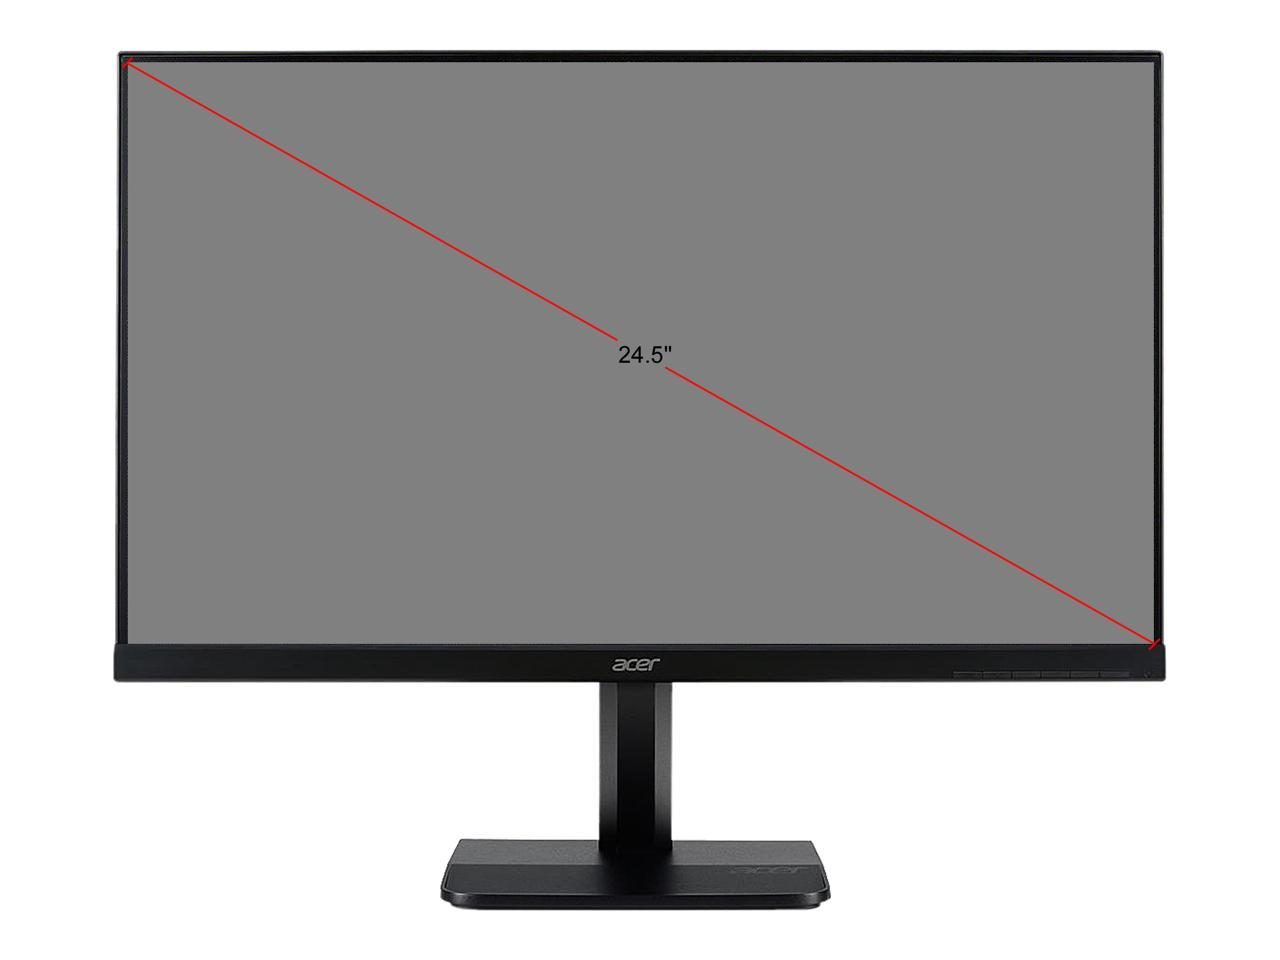 "Details about Acer KA251Q Abmidx Frameless 24 5"" Monitor, 1920 x 1080, 5ms,  Flicker-less, Blue"